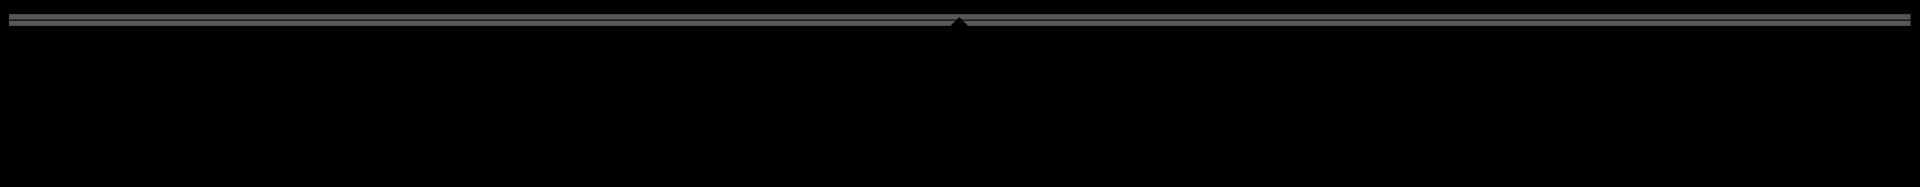 bandeau-plan-mur-2